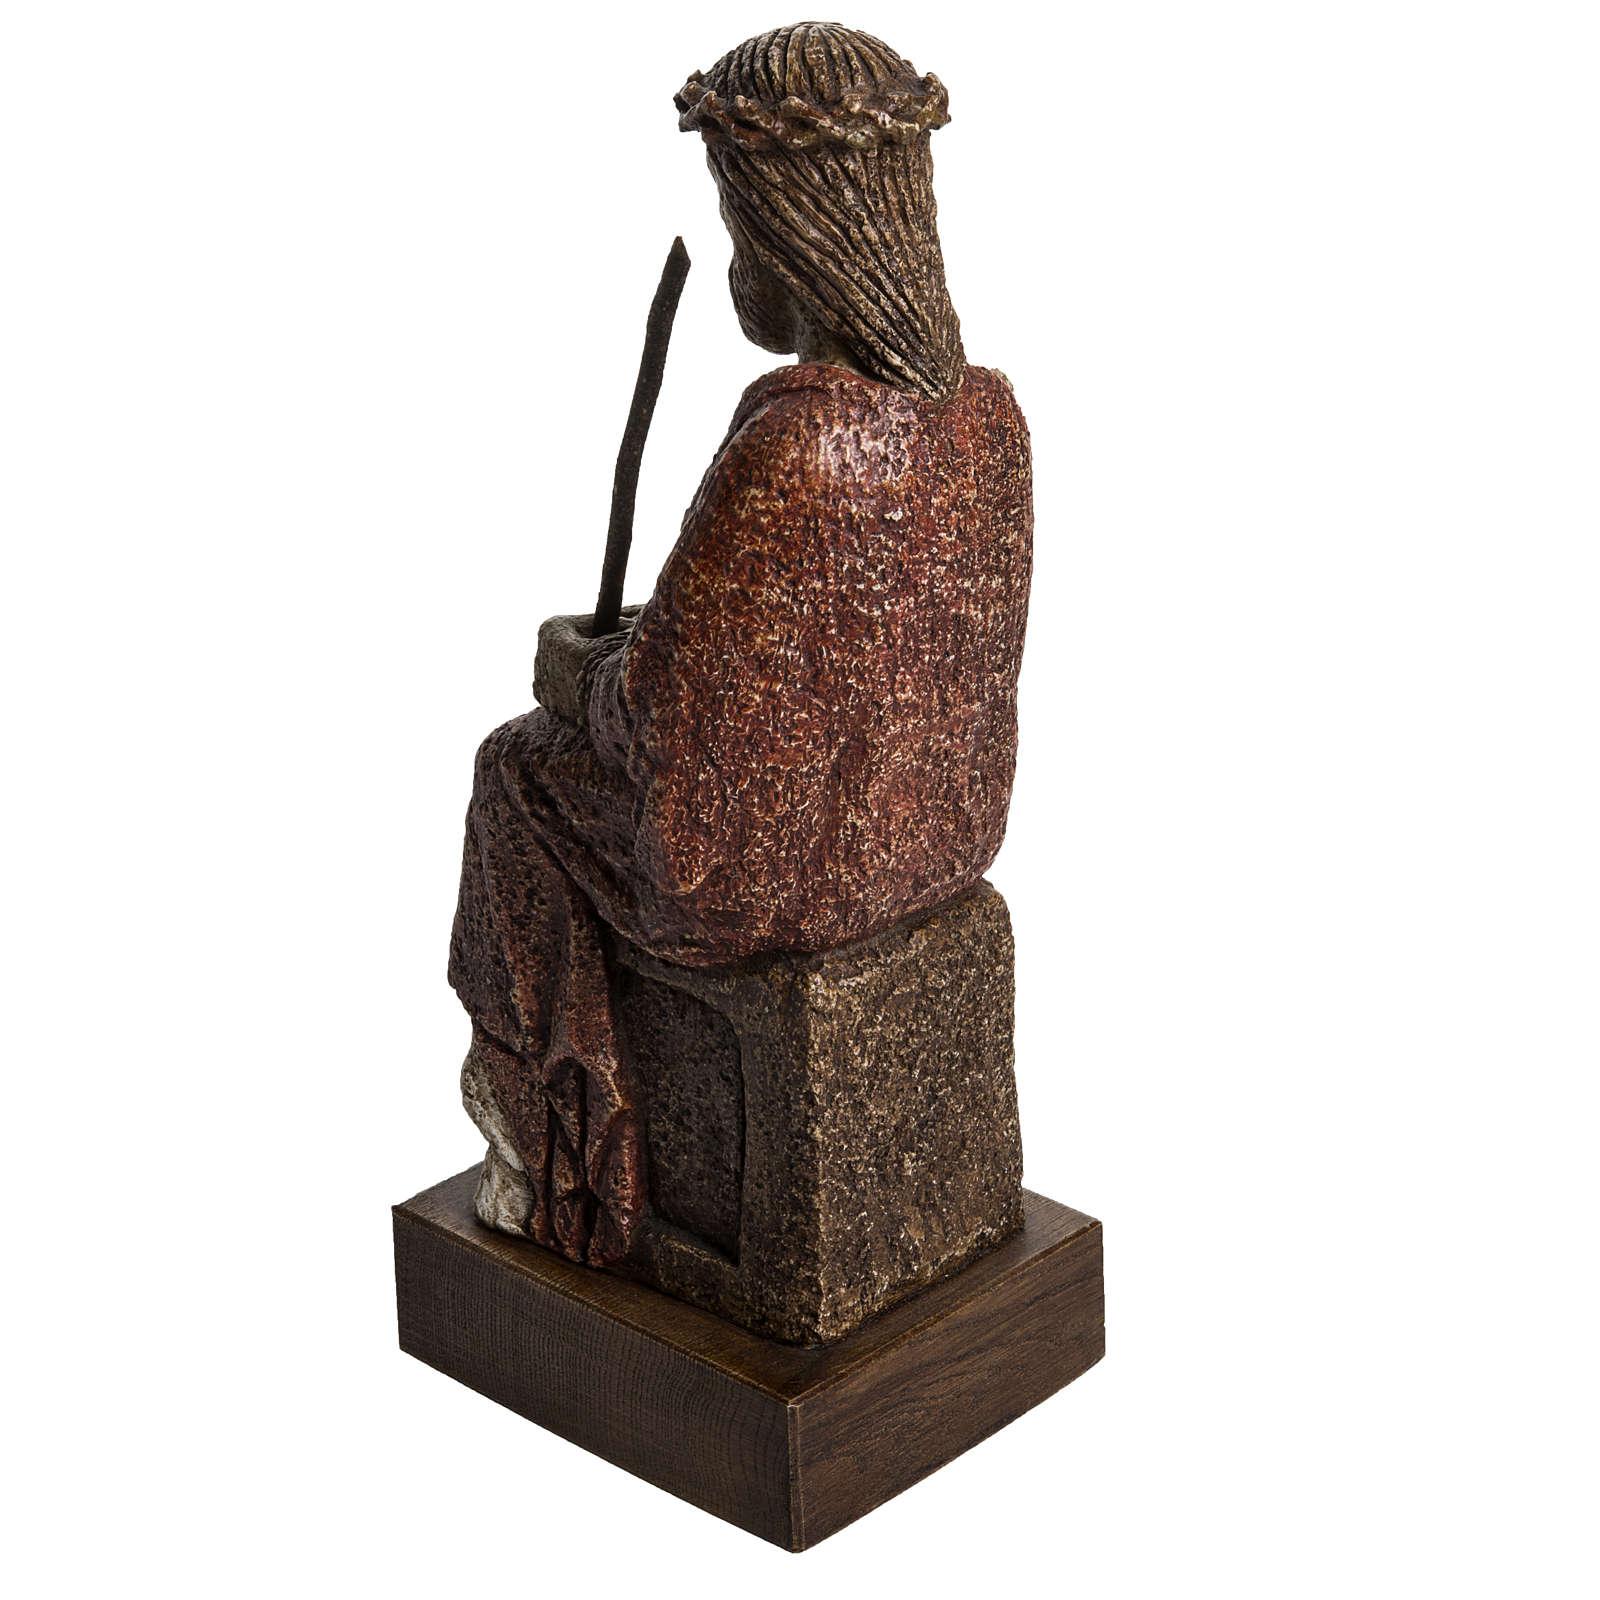 Ecce Homo stone statue 39 cm, Bethlehem Nuns 4